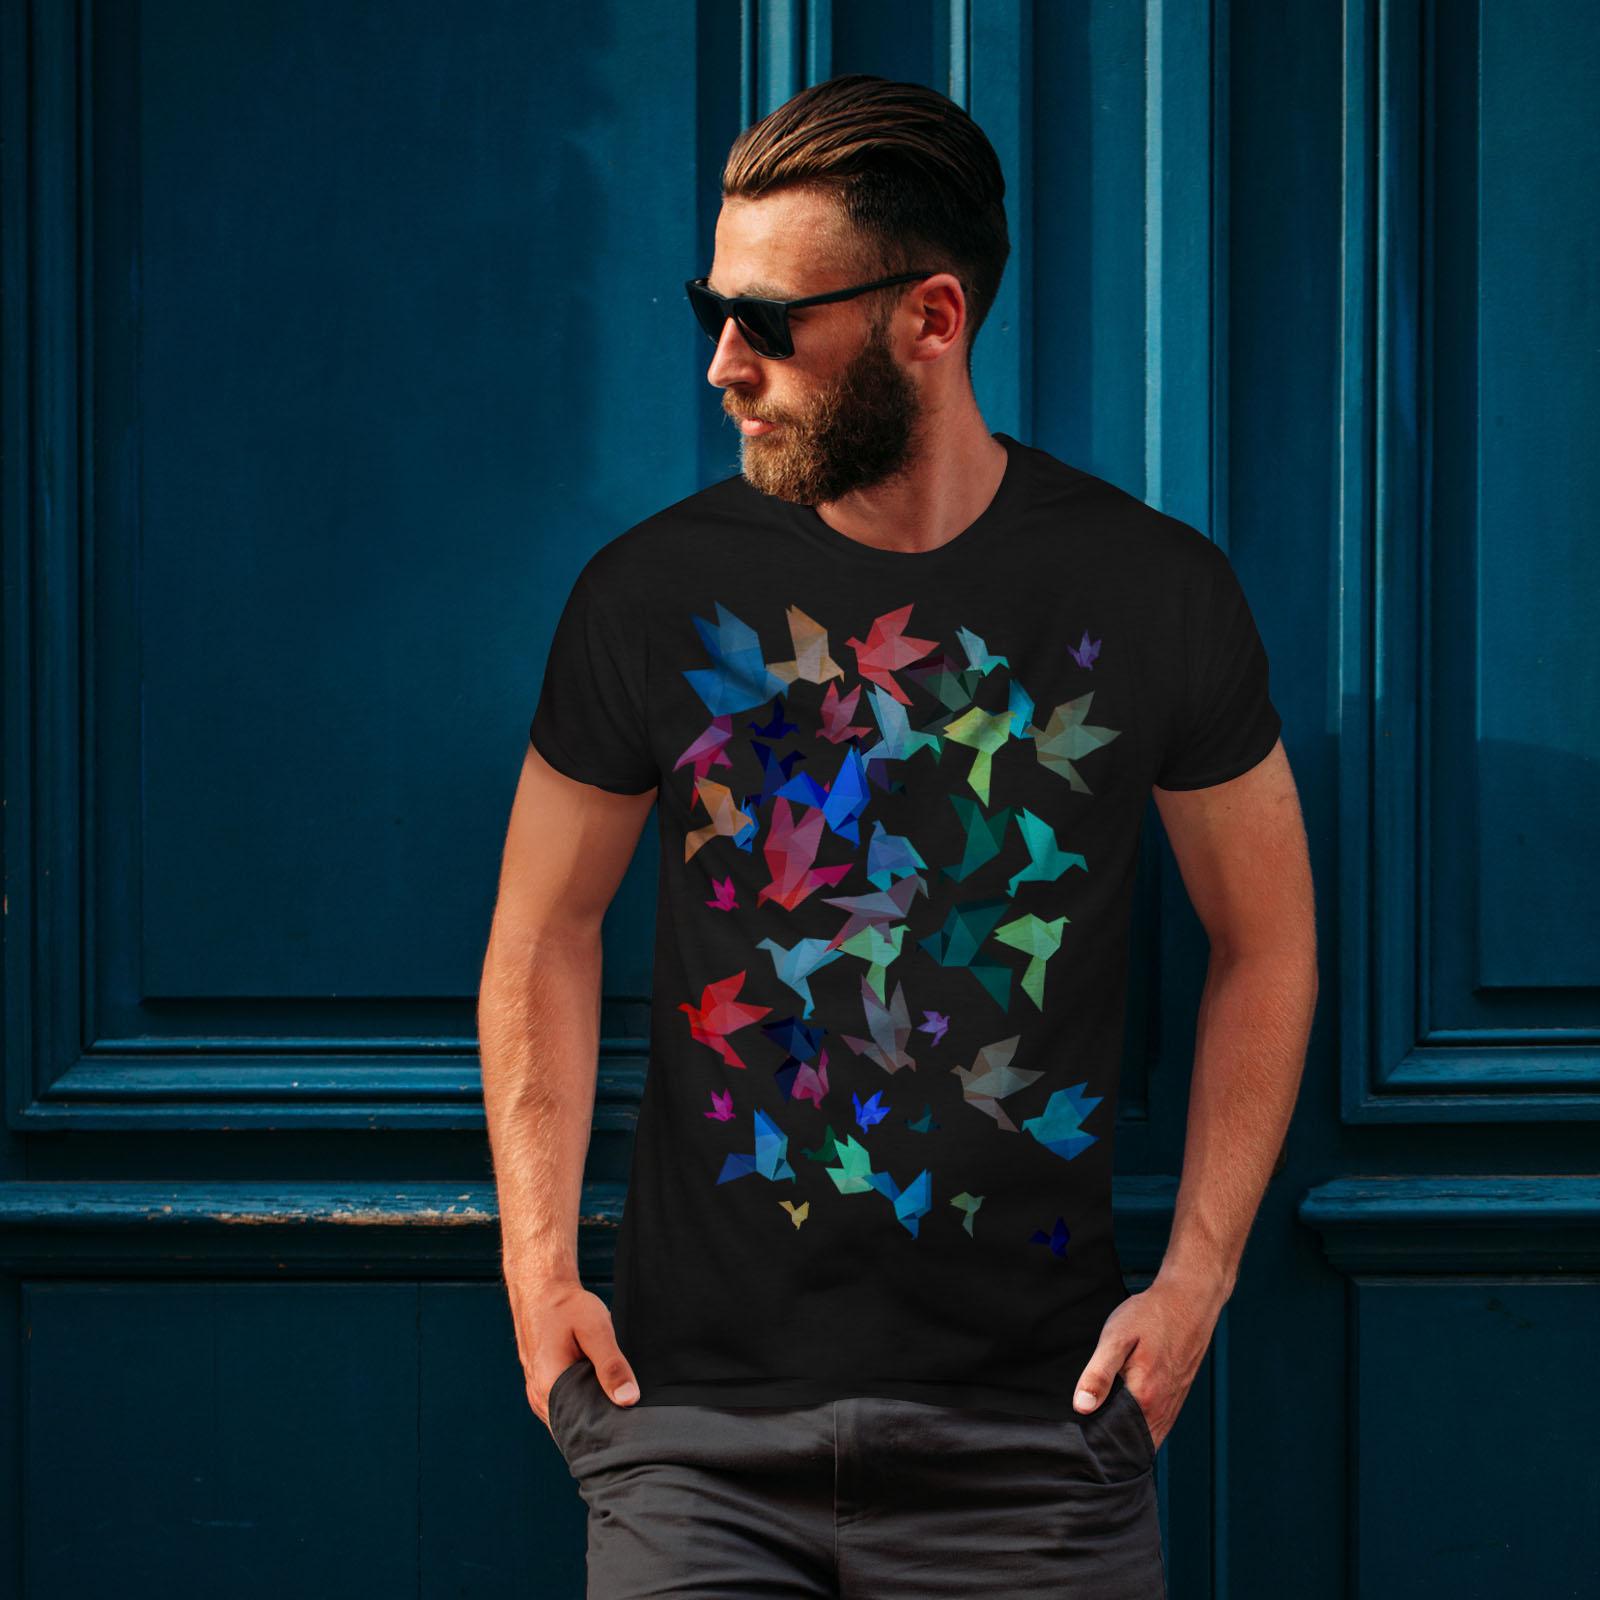 Wellcoda-Origami-Bird-Colors-Mens-T-shirt-Craft-Graphic-Design-Printed-Tee thumbnail 4